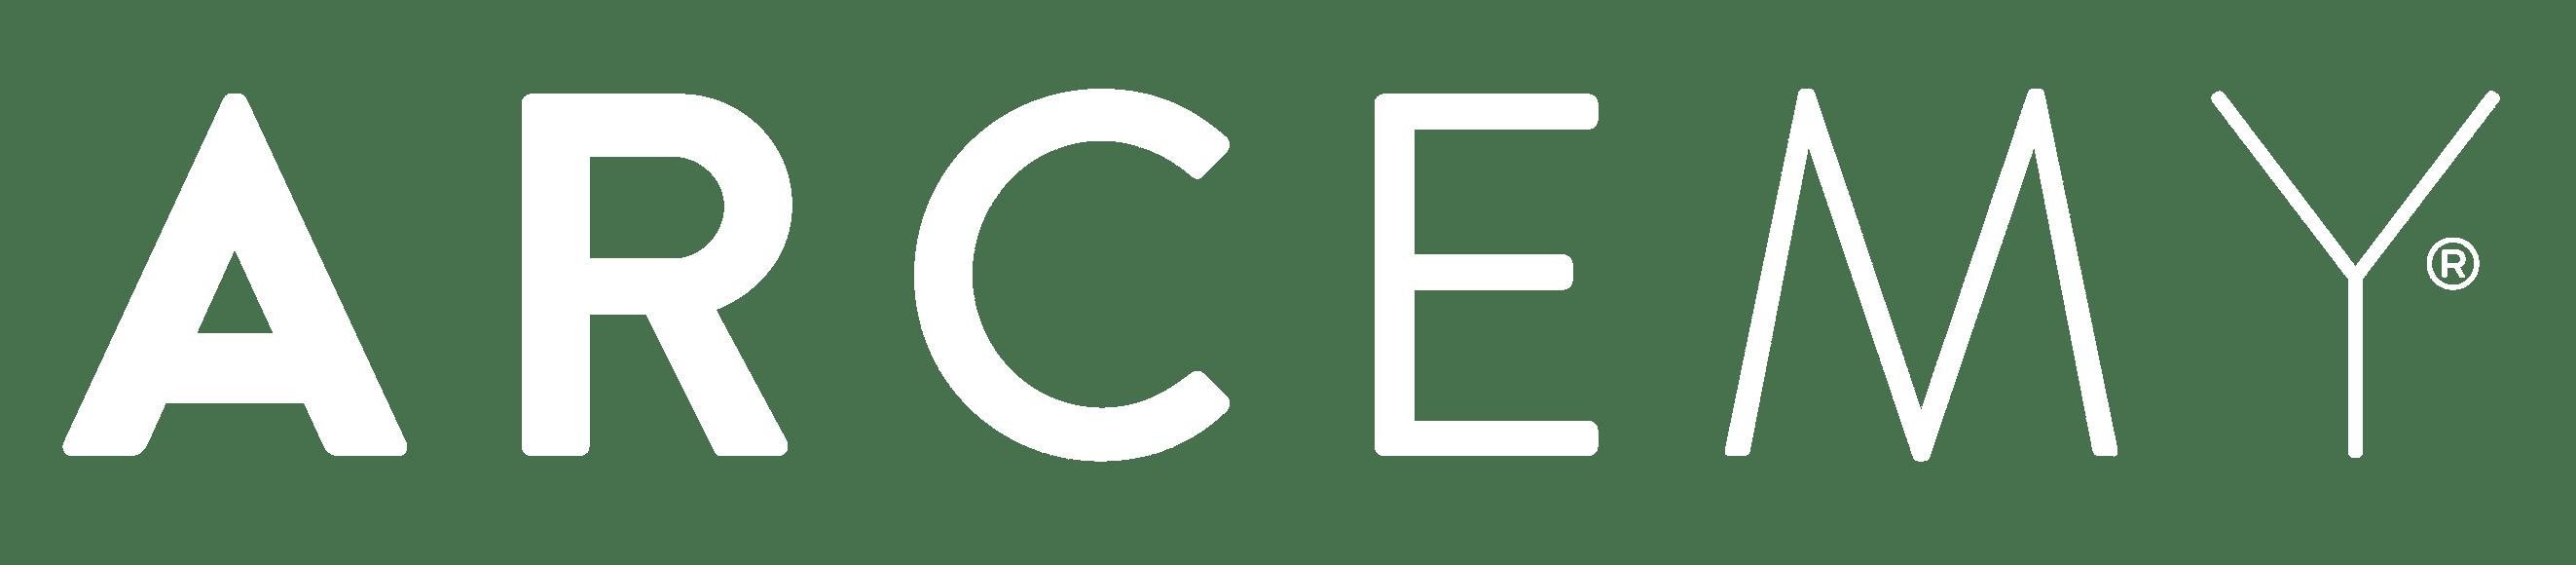 ARCEMY® logo